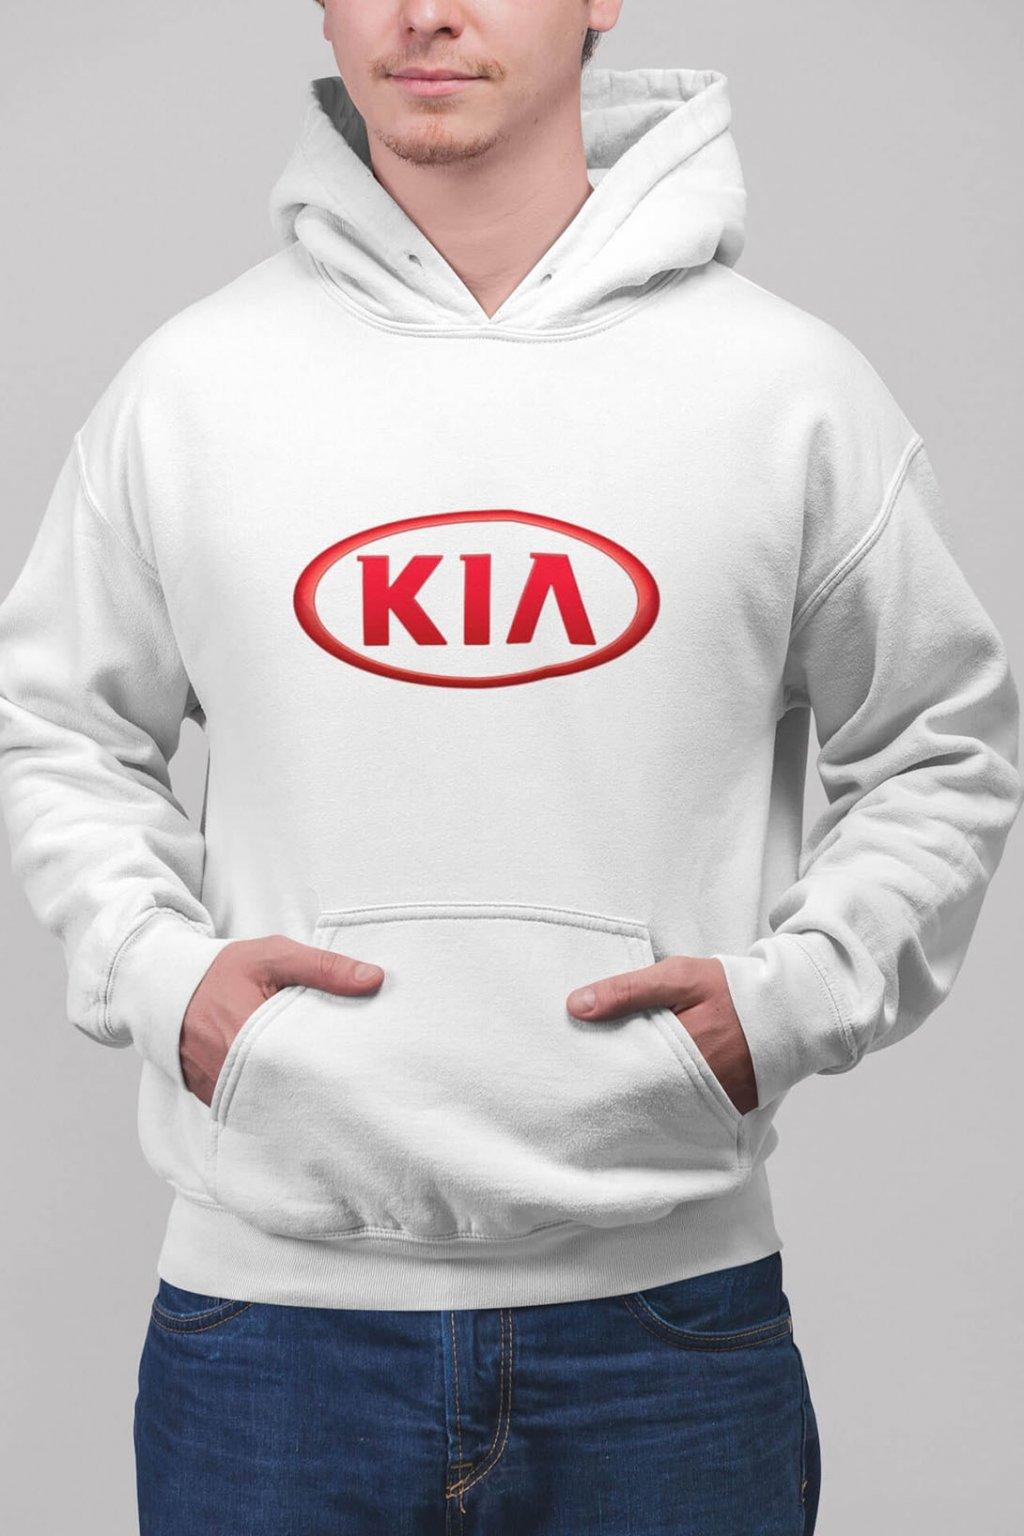 Pánska mikina s logom auta Kia